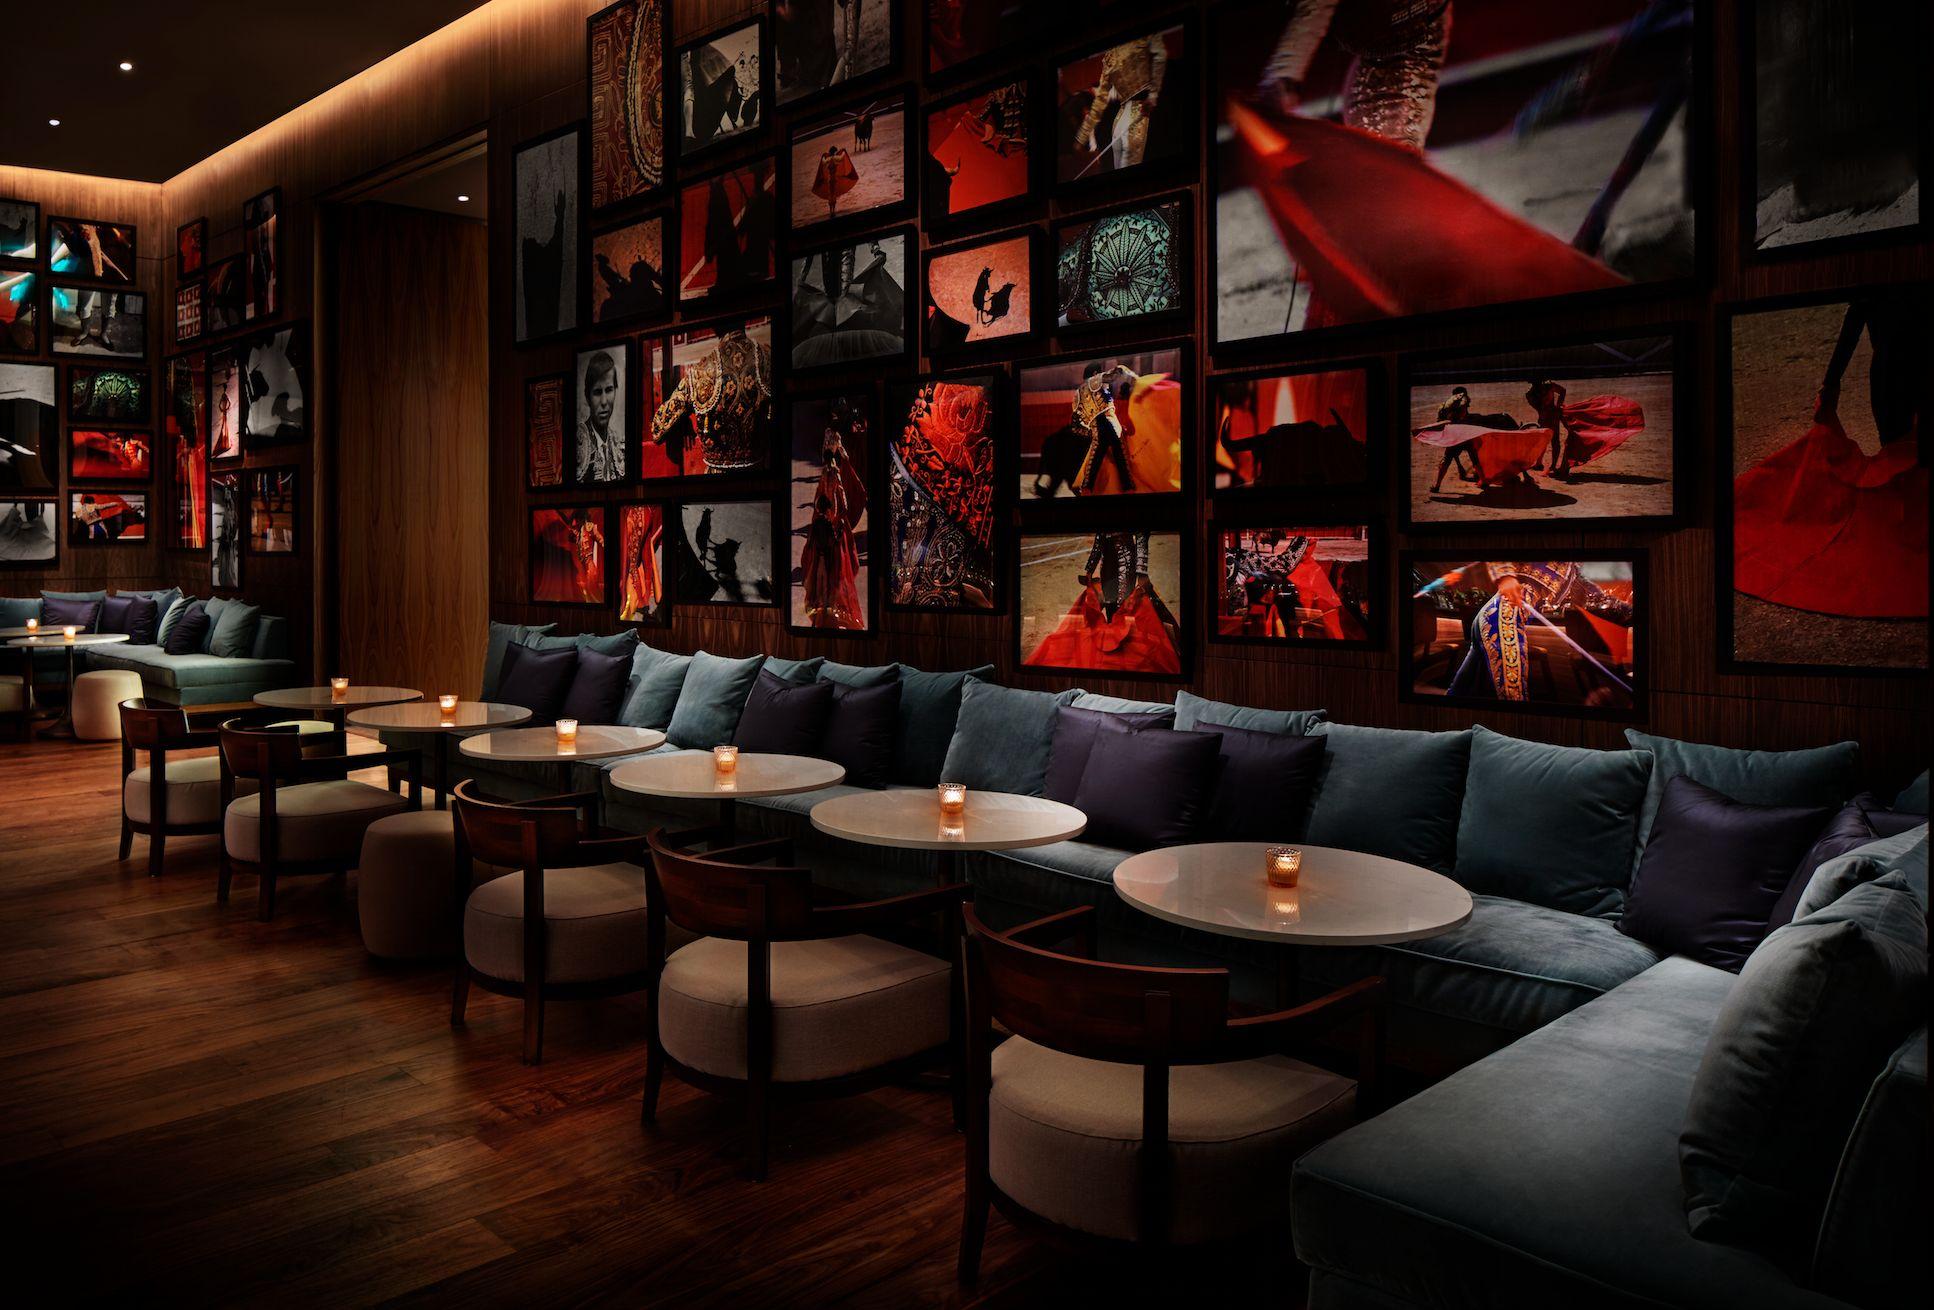 Giorgio Armani Lends His Warm, Elegant Touch to the Revamped Nobu ...